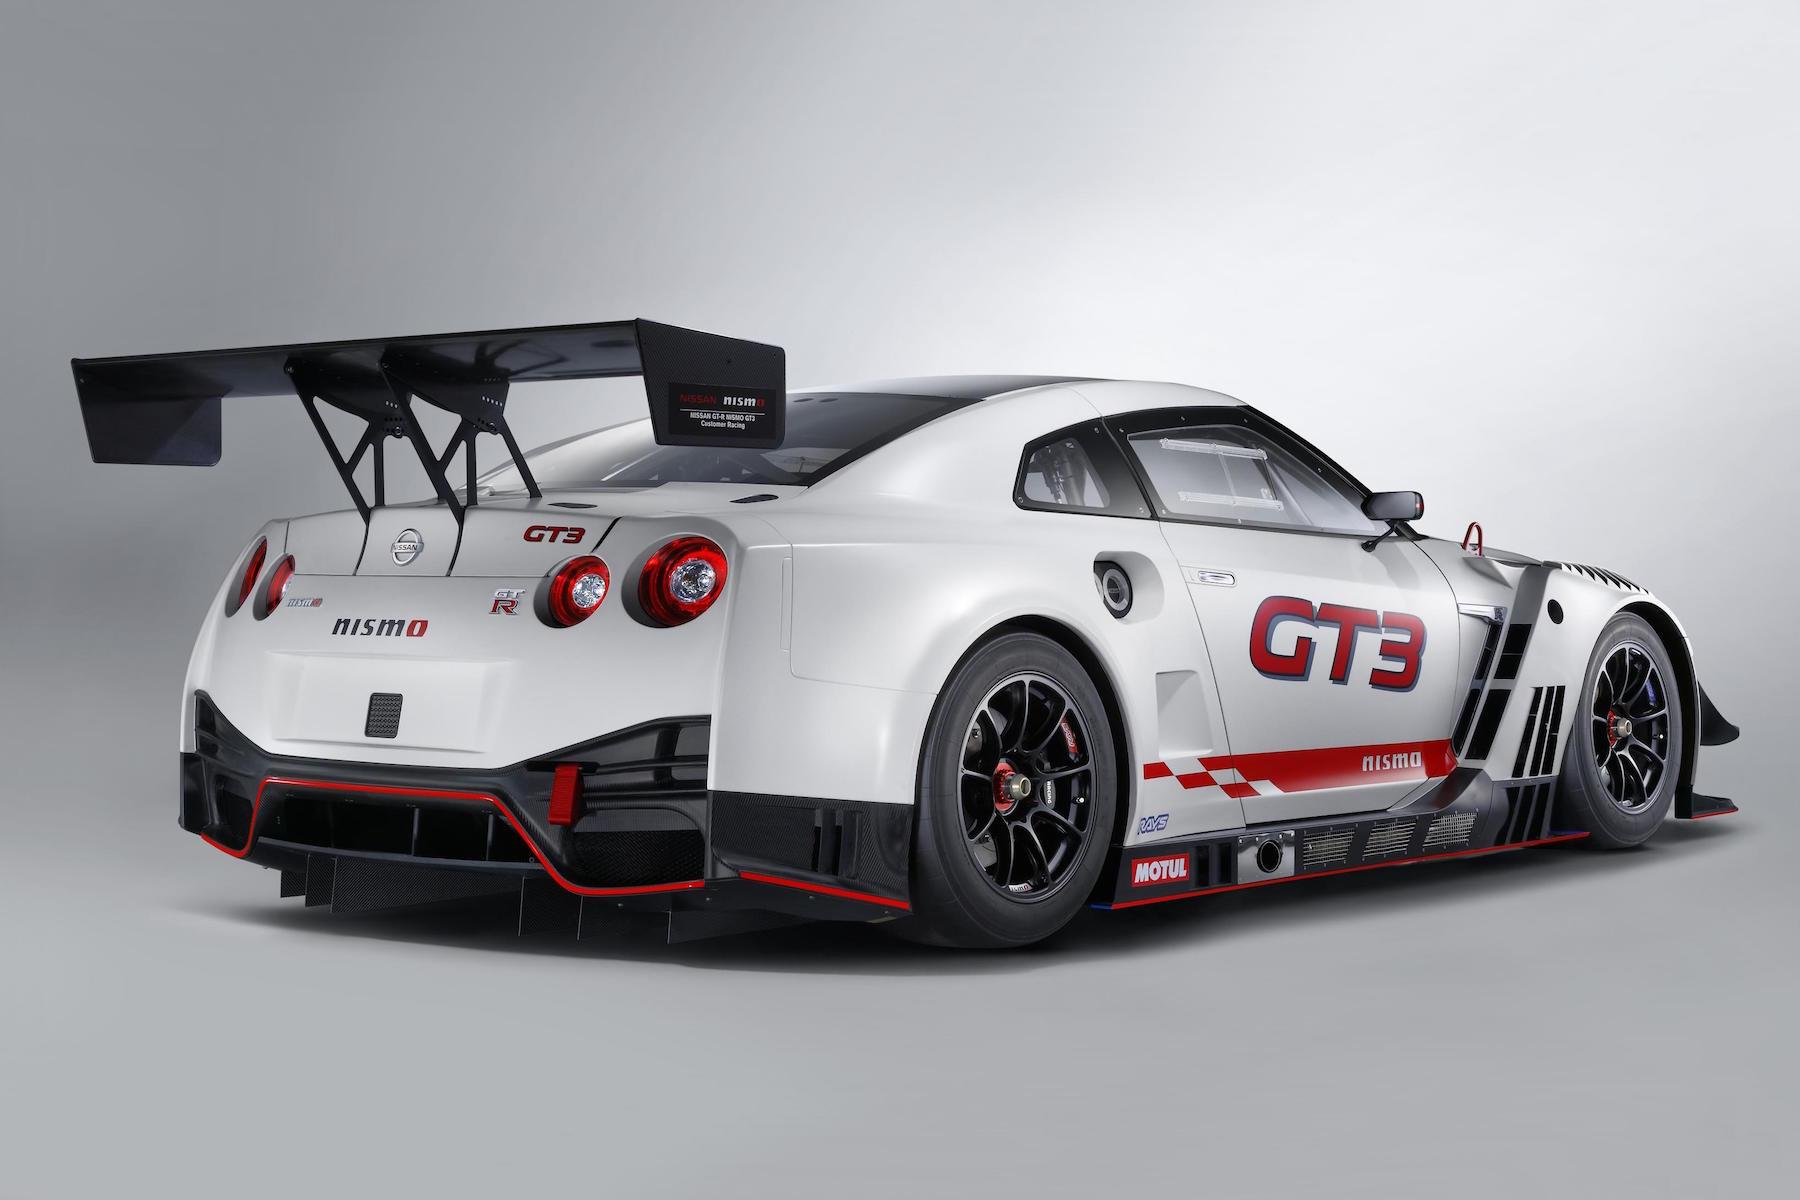 2018 Nissan GT-R Nismo GT3